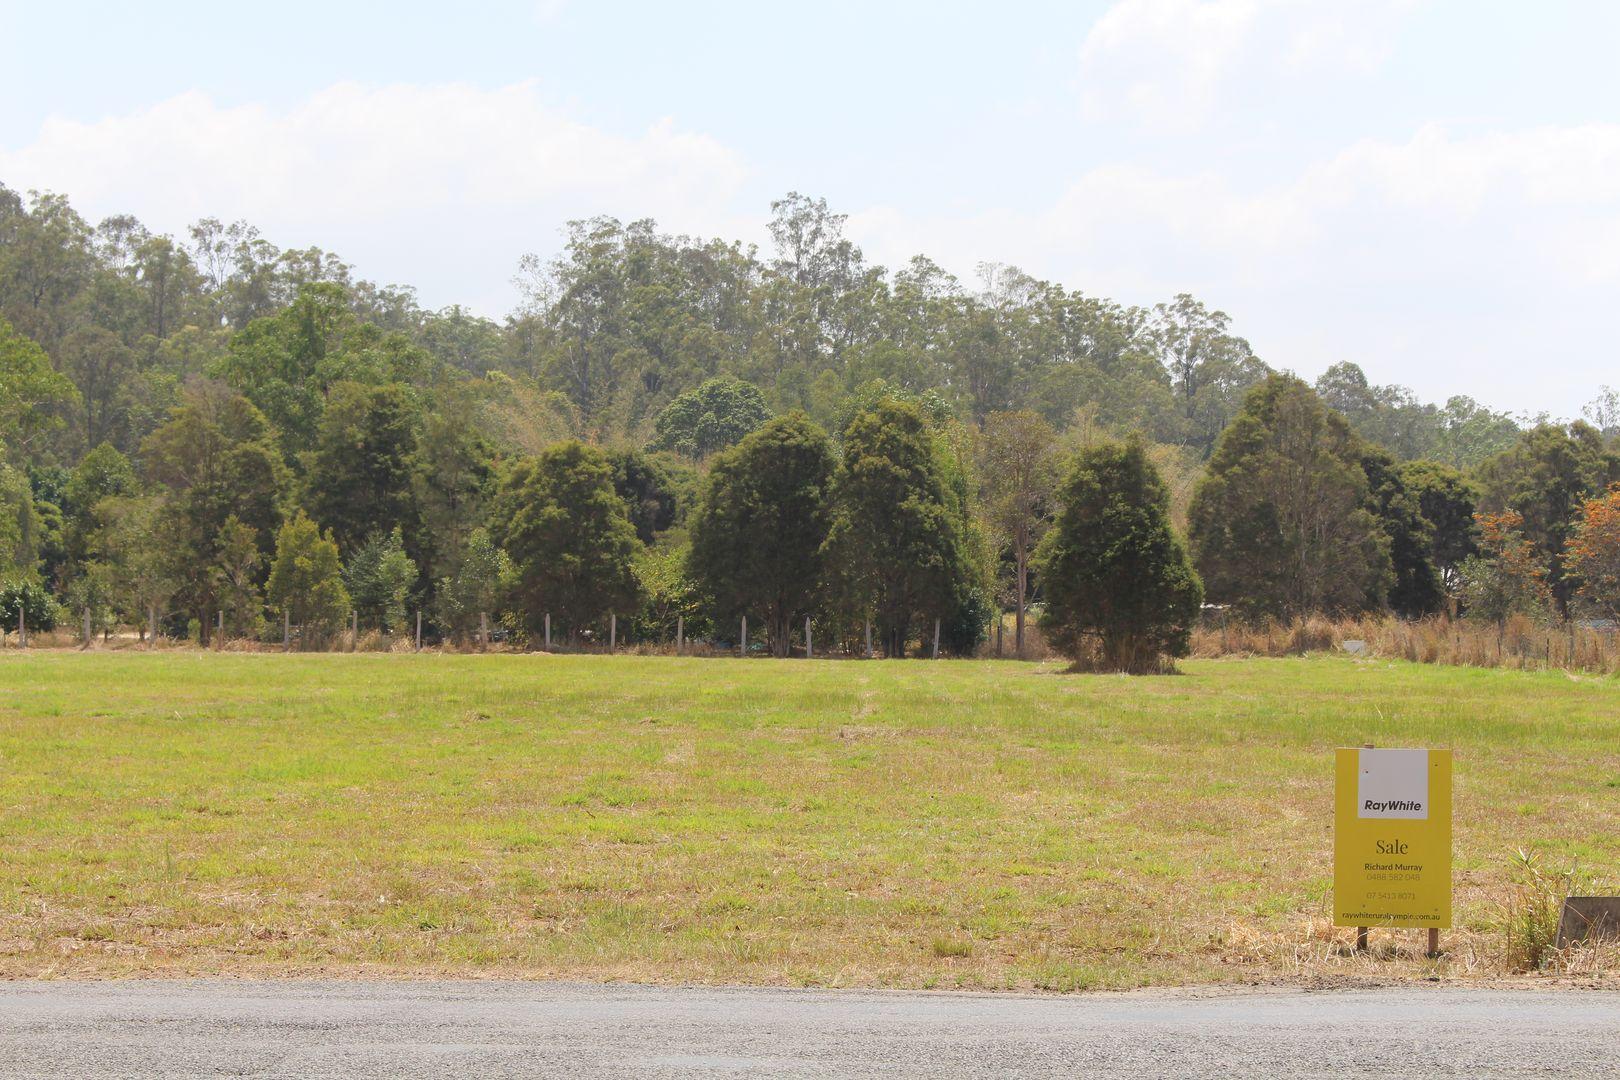 Lot 57 Arborten Road, Glenwood QLD 4570, Image 1